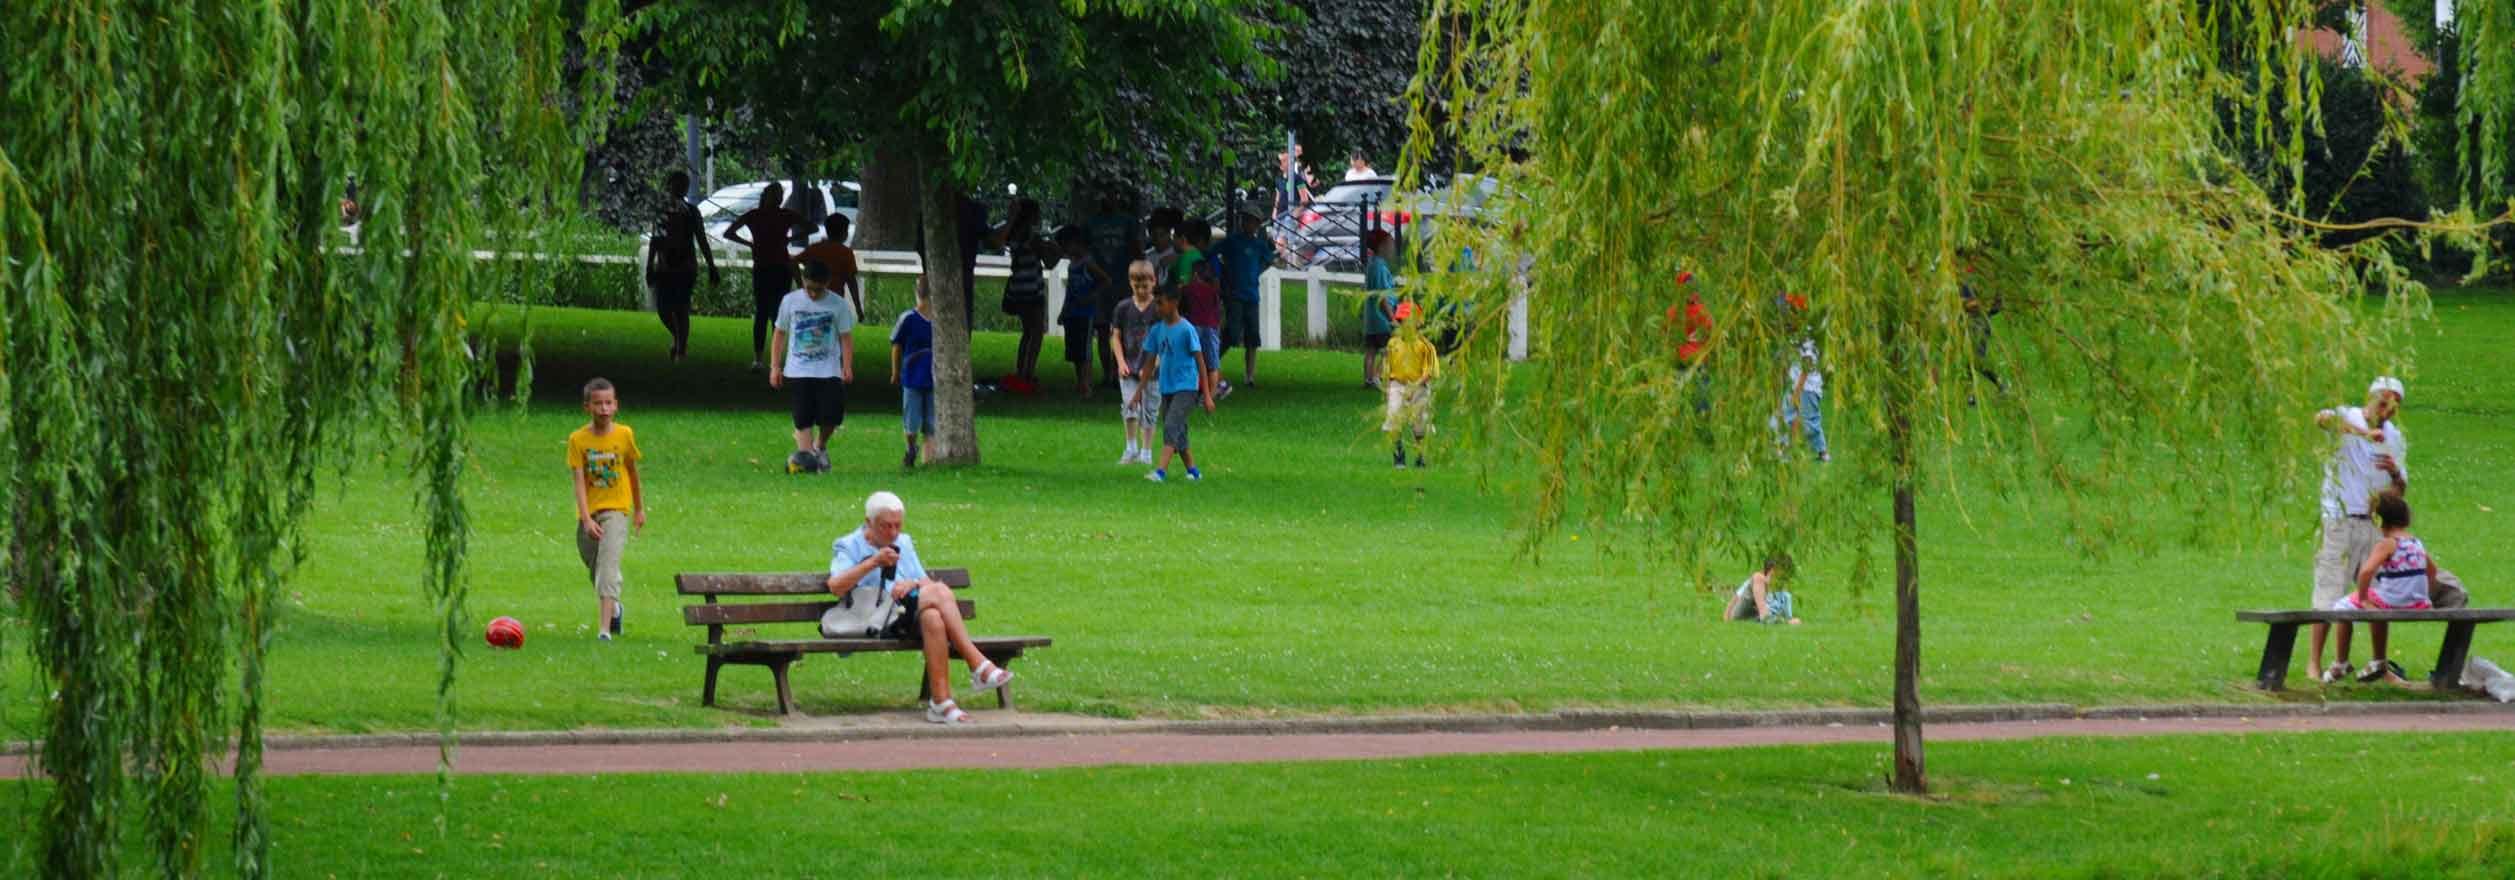 Parcs et jardins visite guid e de tourcoing ma ville tourcoing - Petit jardin de charme tourcoing ...